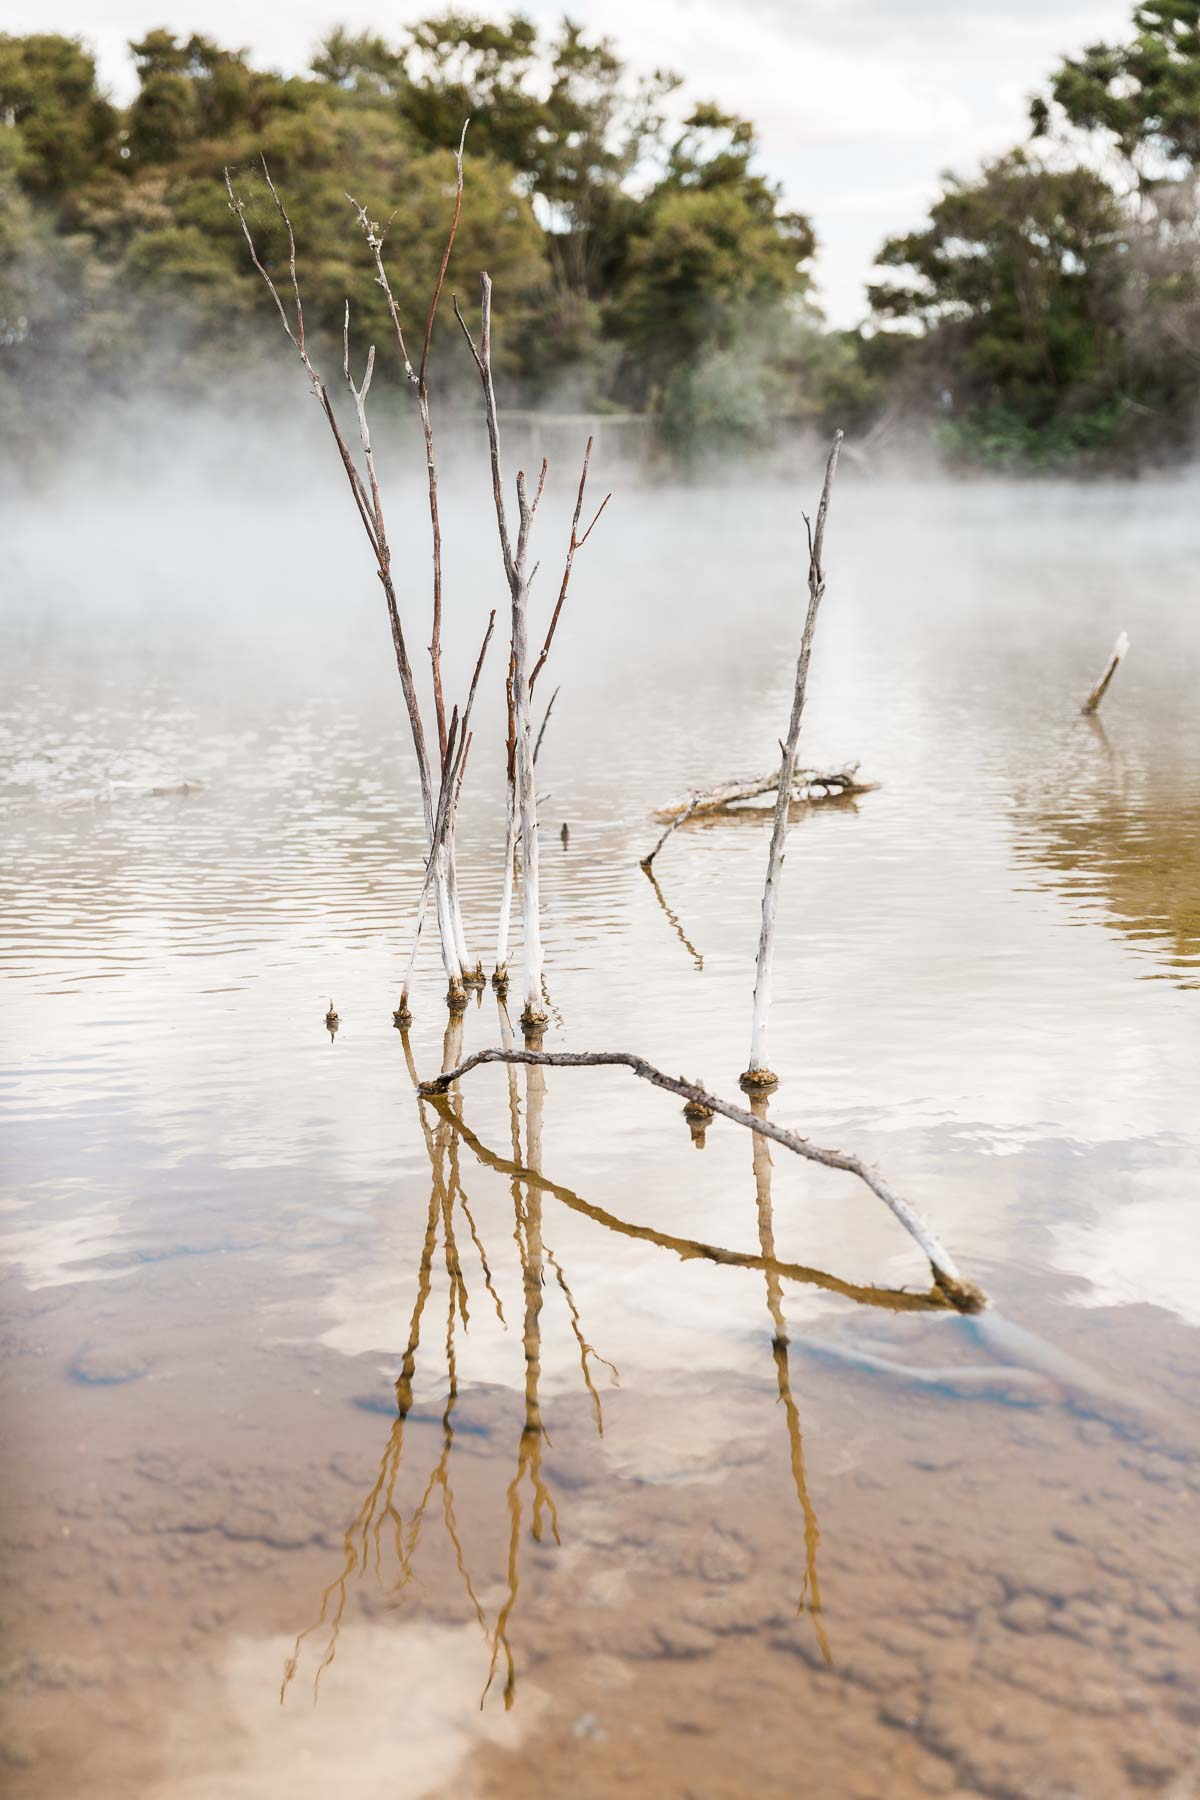 kuirau-park-rotorua-geothermal-activity-hot-water-north-island-new-zealand-amalia-bastos.jpg